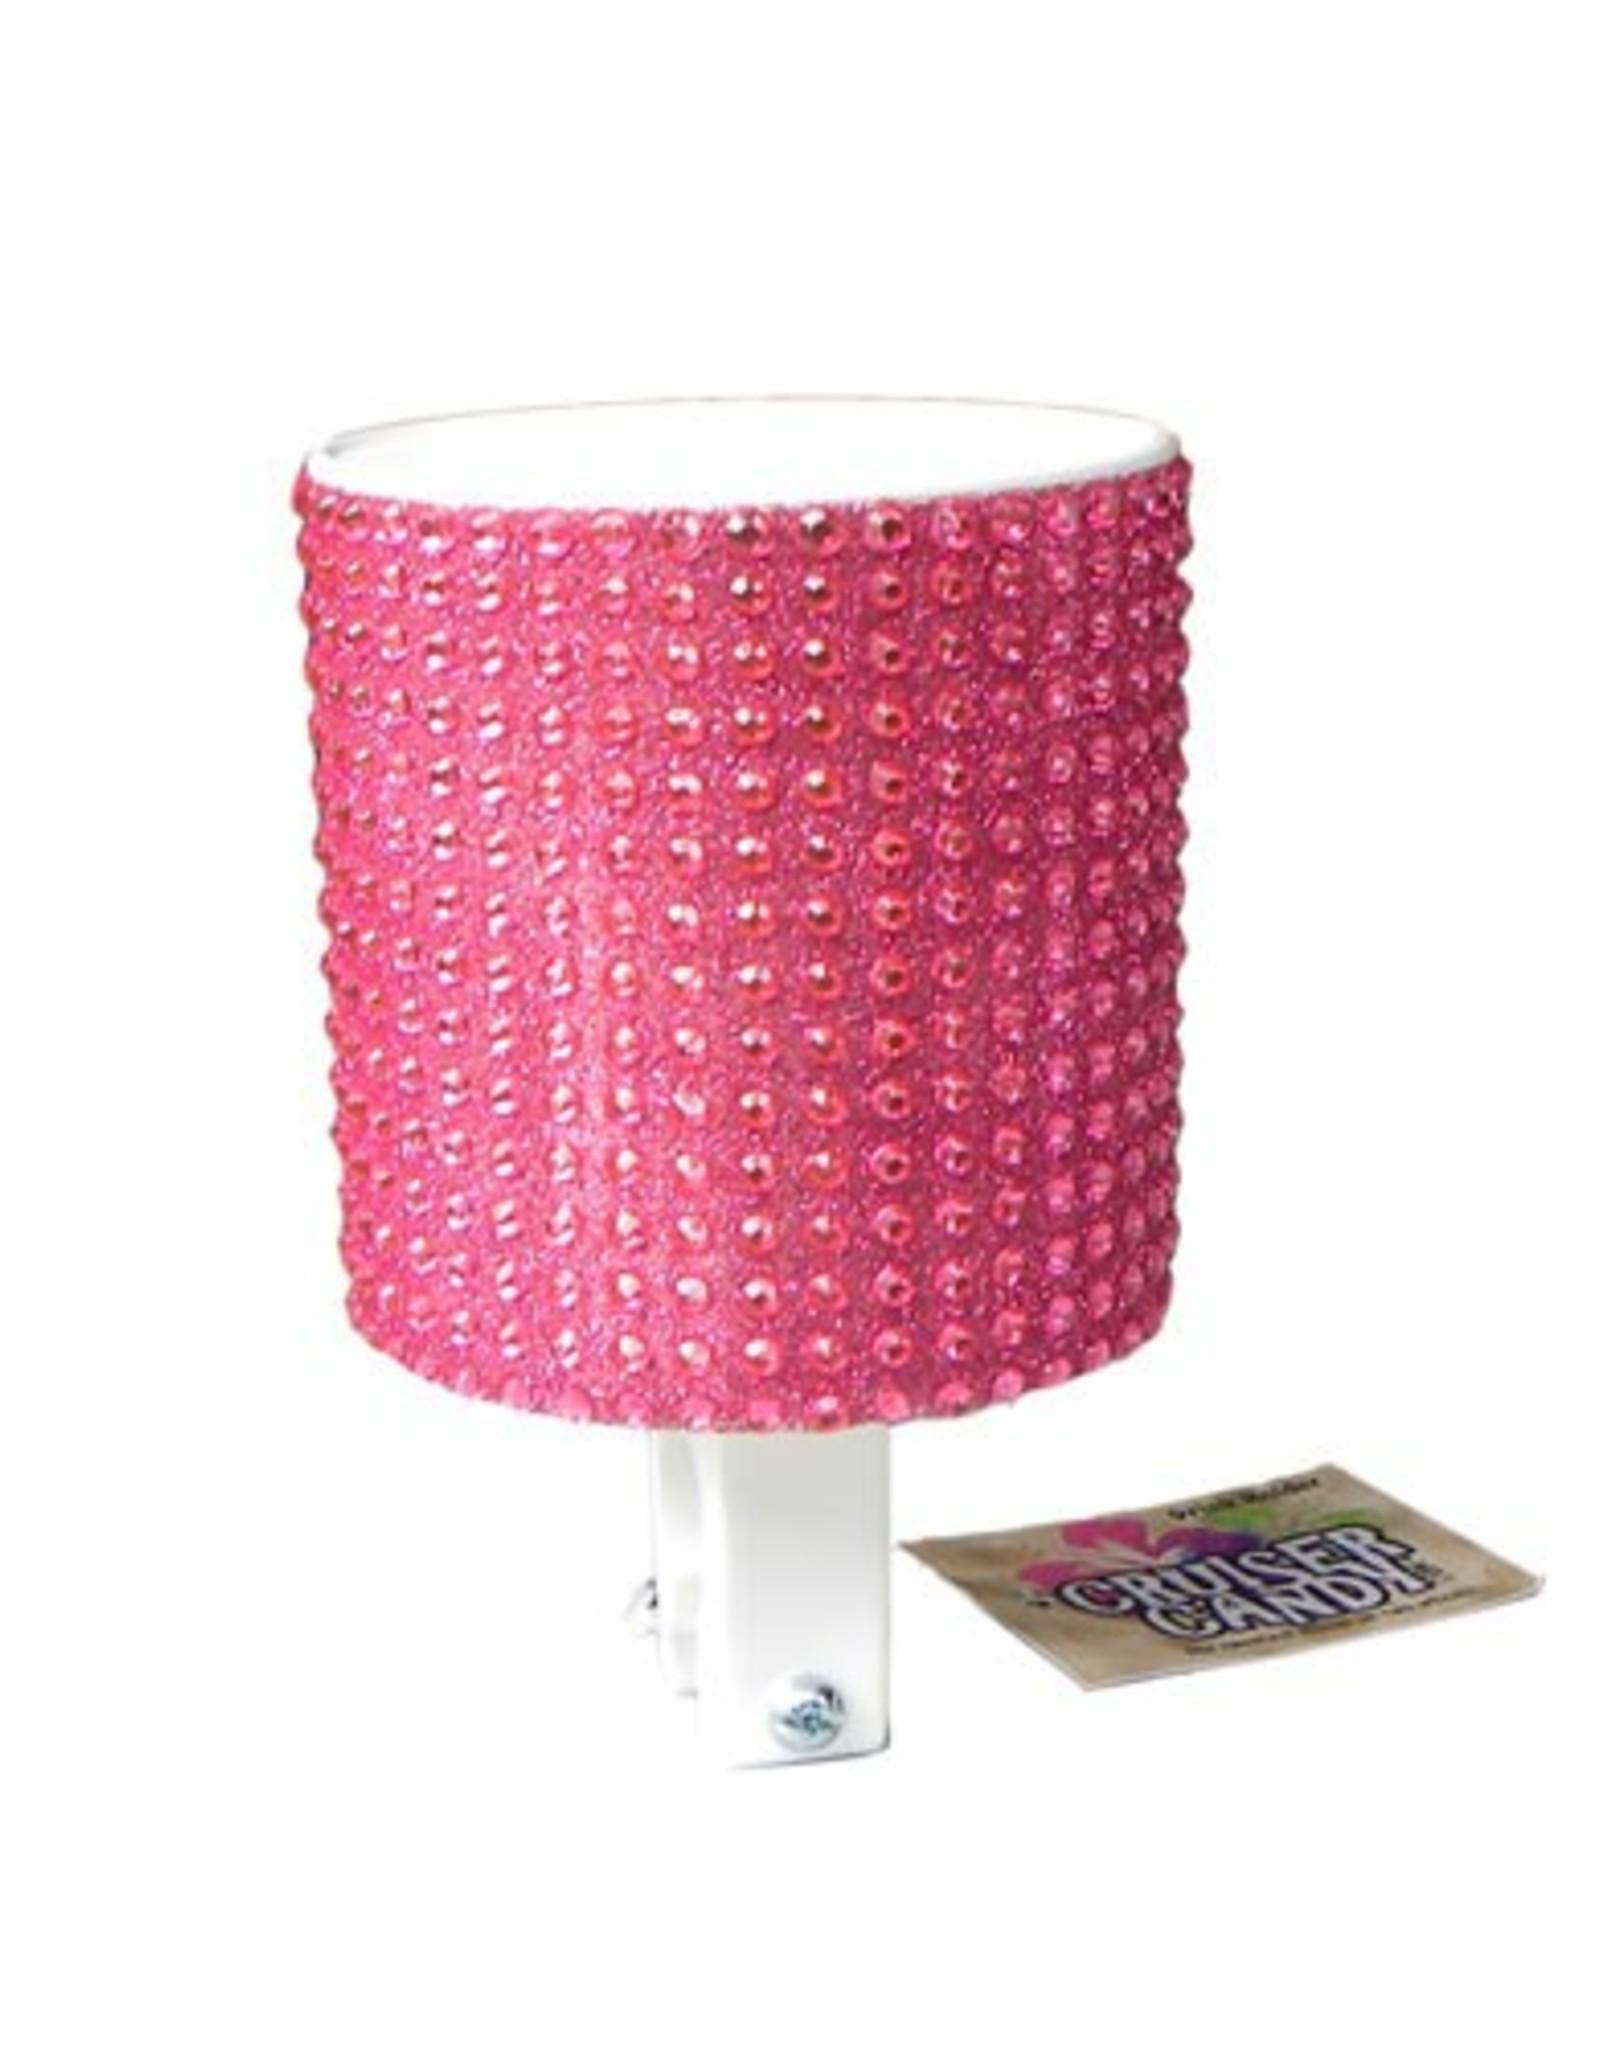 Cruiser Candy Pink Bubble Gum Rhinestone Drink Holder